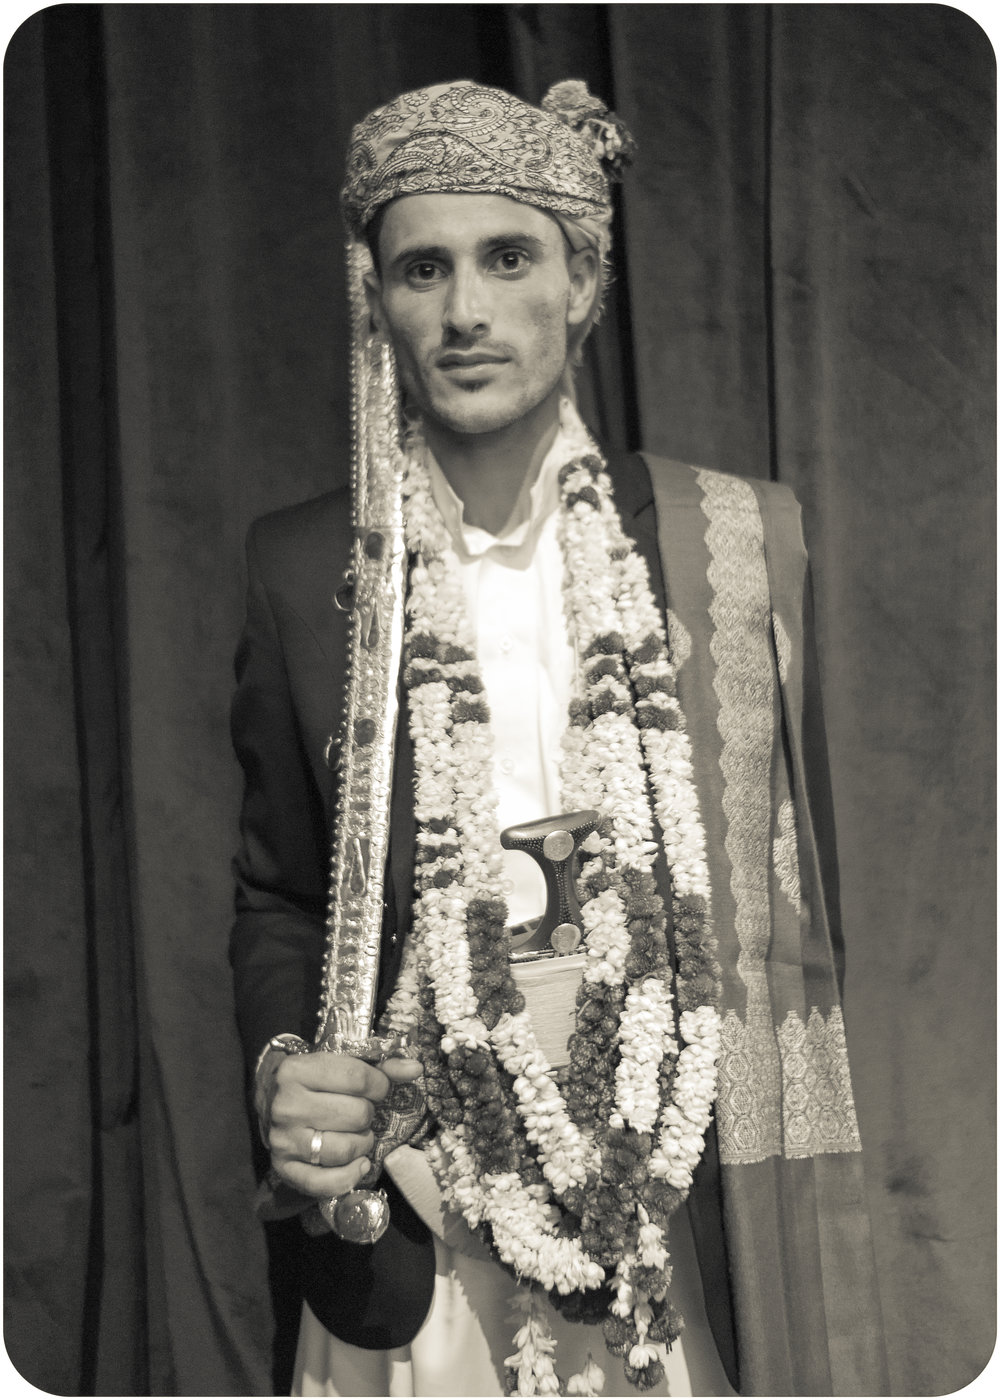 Mohammed Ahmed Ali AlHaashdi